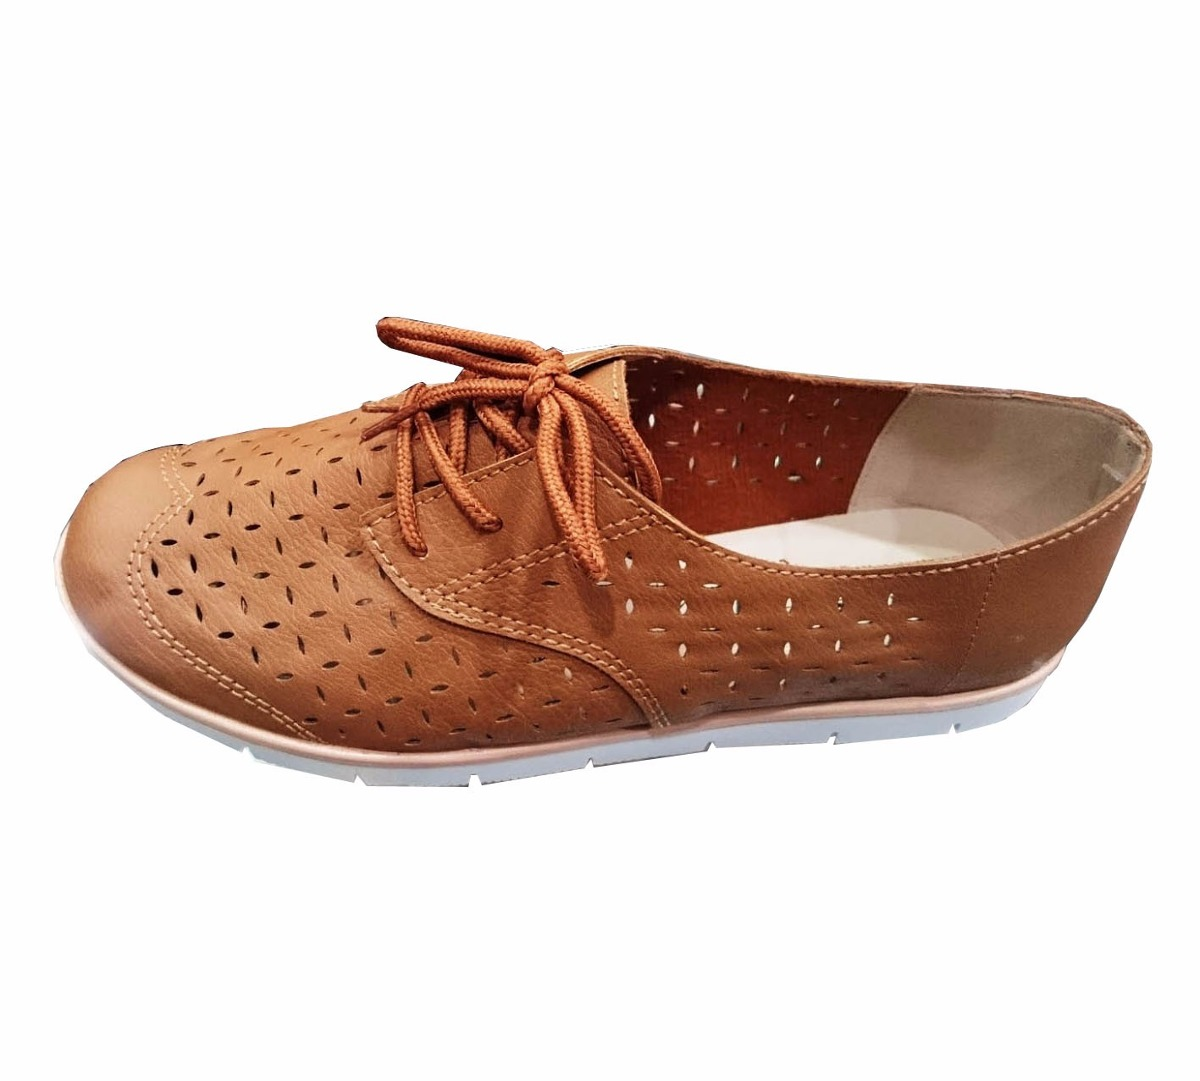 43d2f7280 sapato feminino moleca oxford caramelo. Carregando zoom.